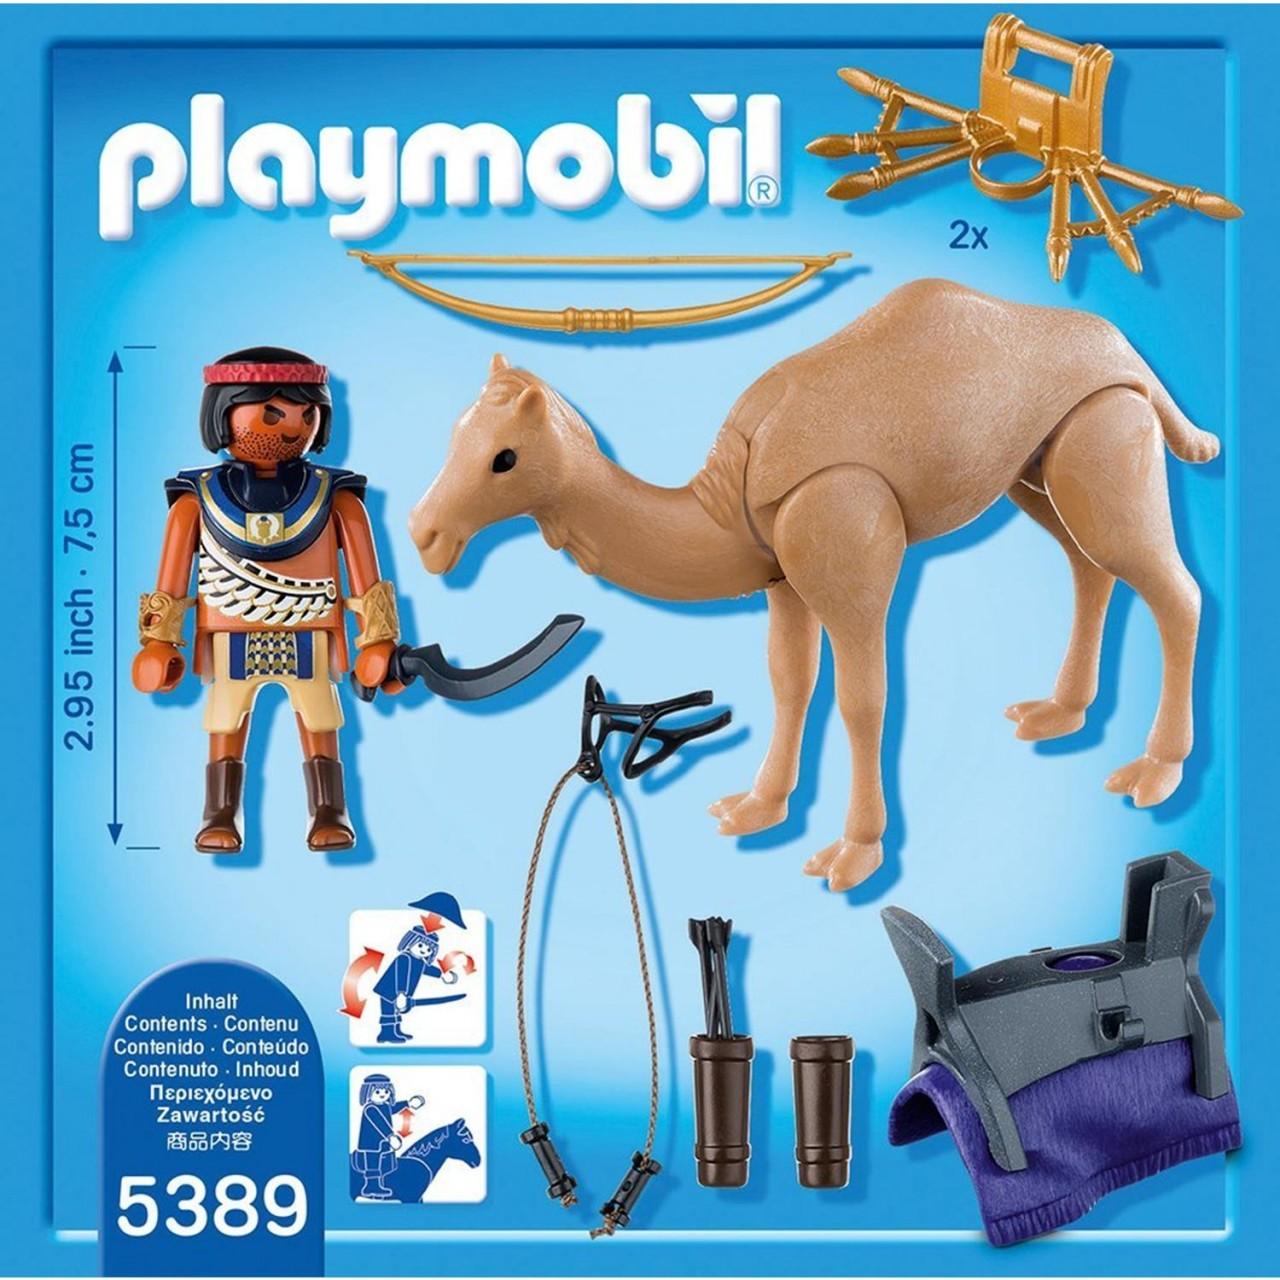 Playmobil 5389 Ägyptischer Kamelkämpfer